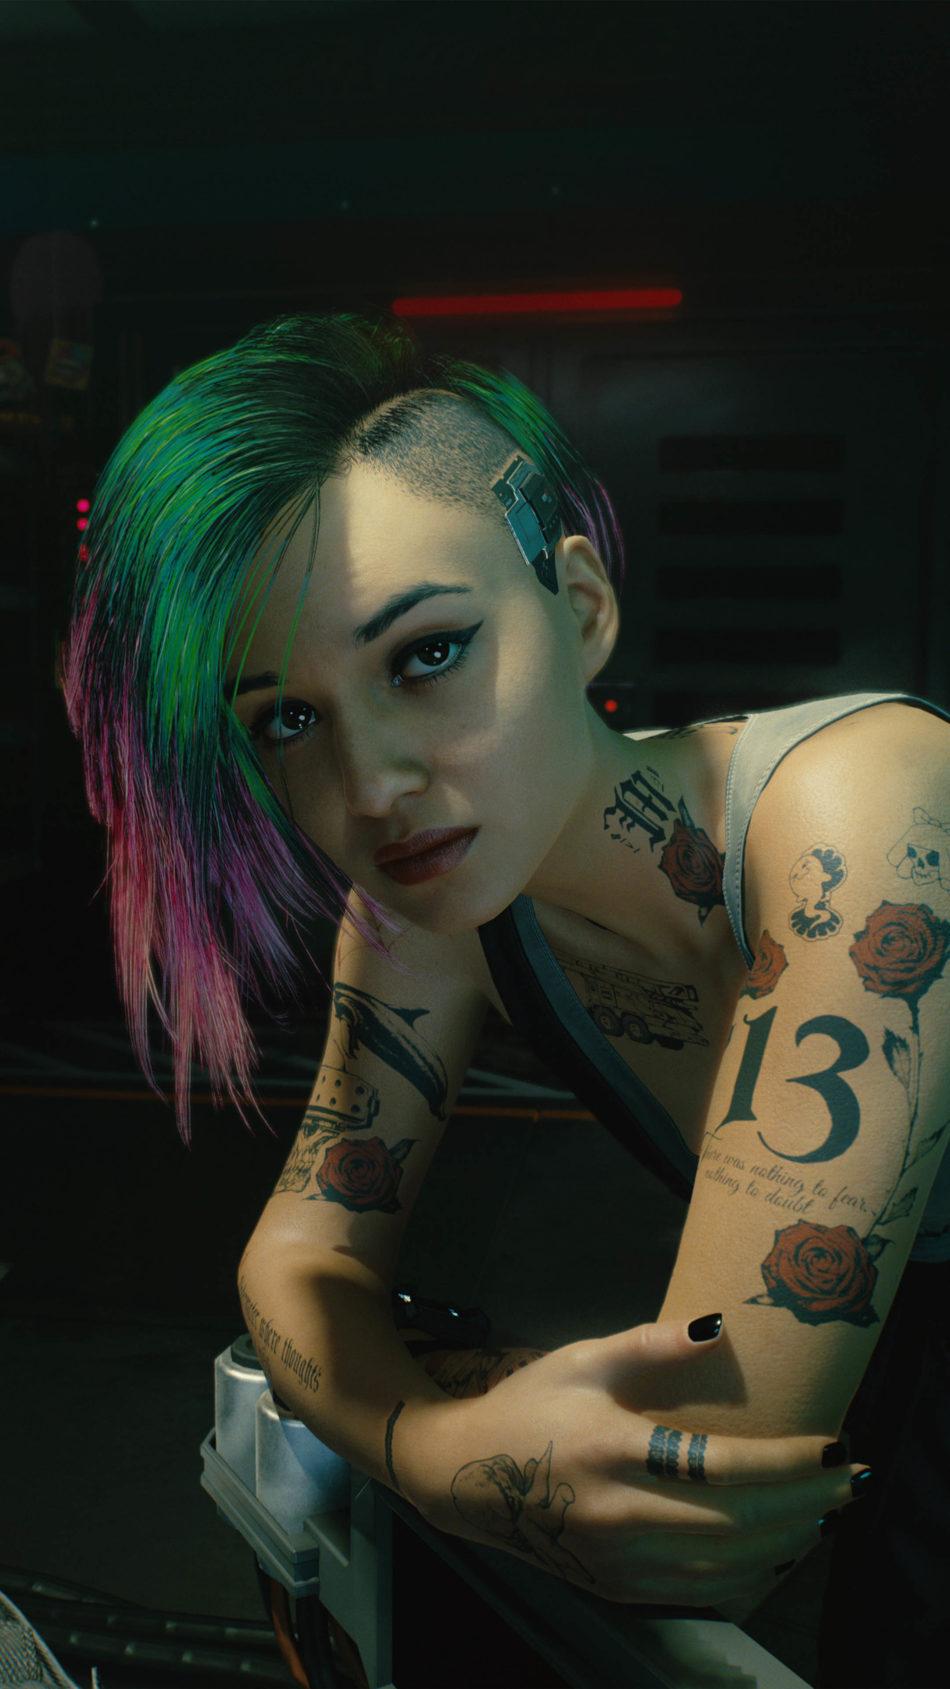 Judy Alvarez Cyberpunk 2077 4K Ultra HD Mobile Wallpaper